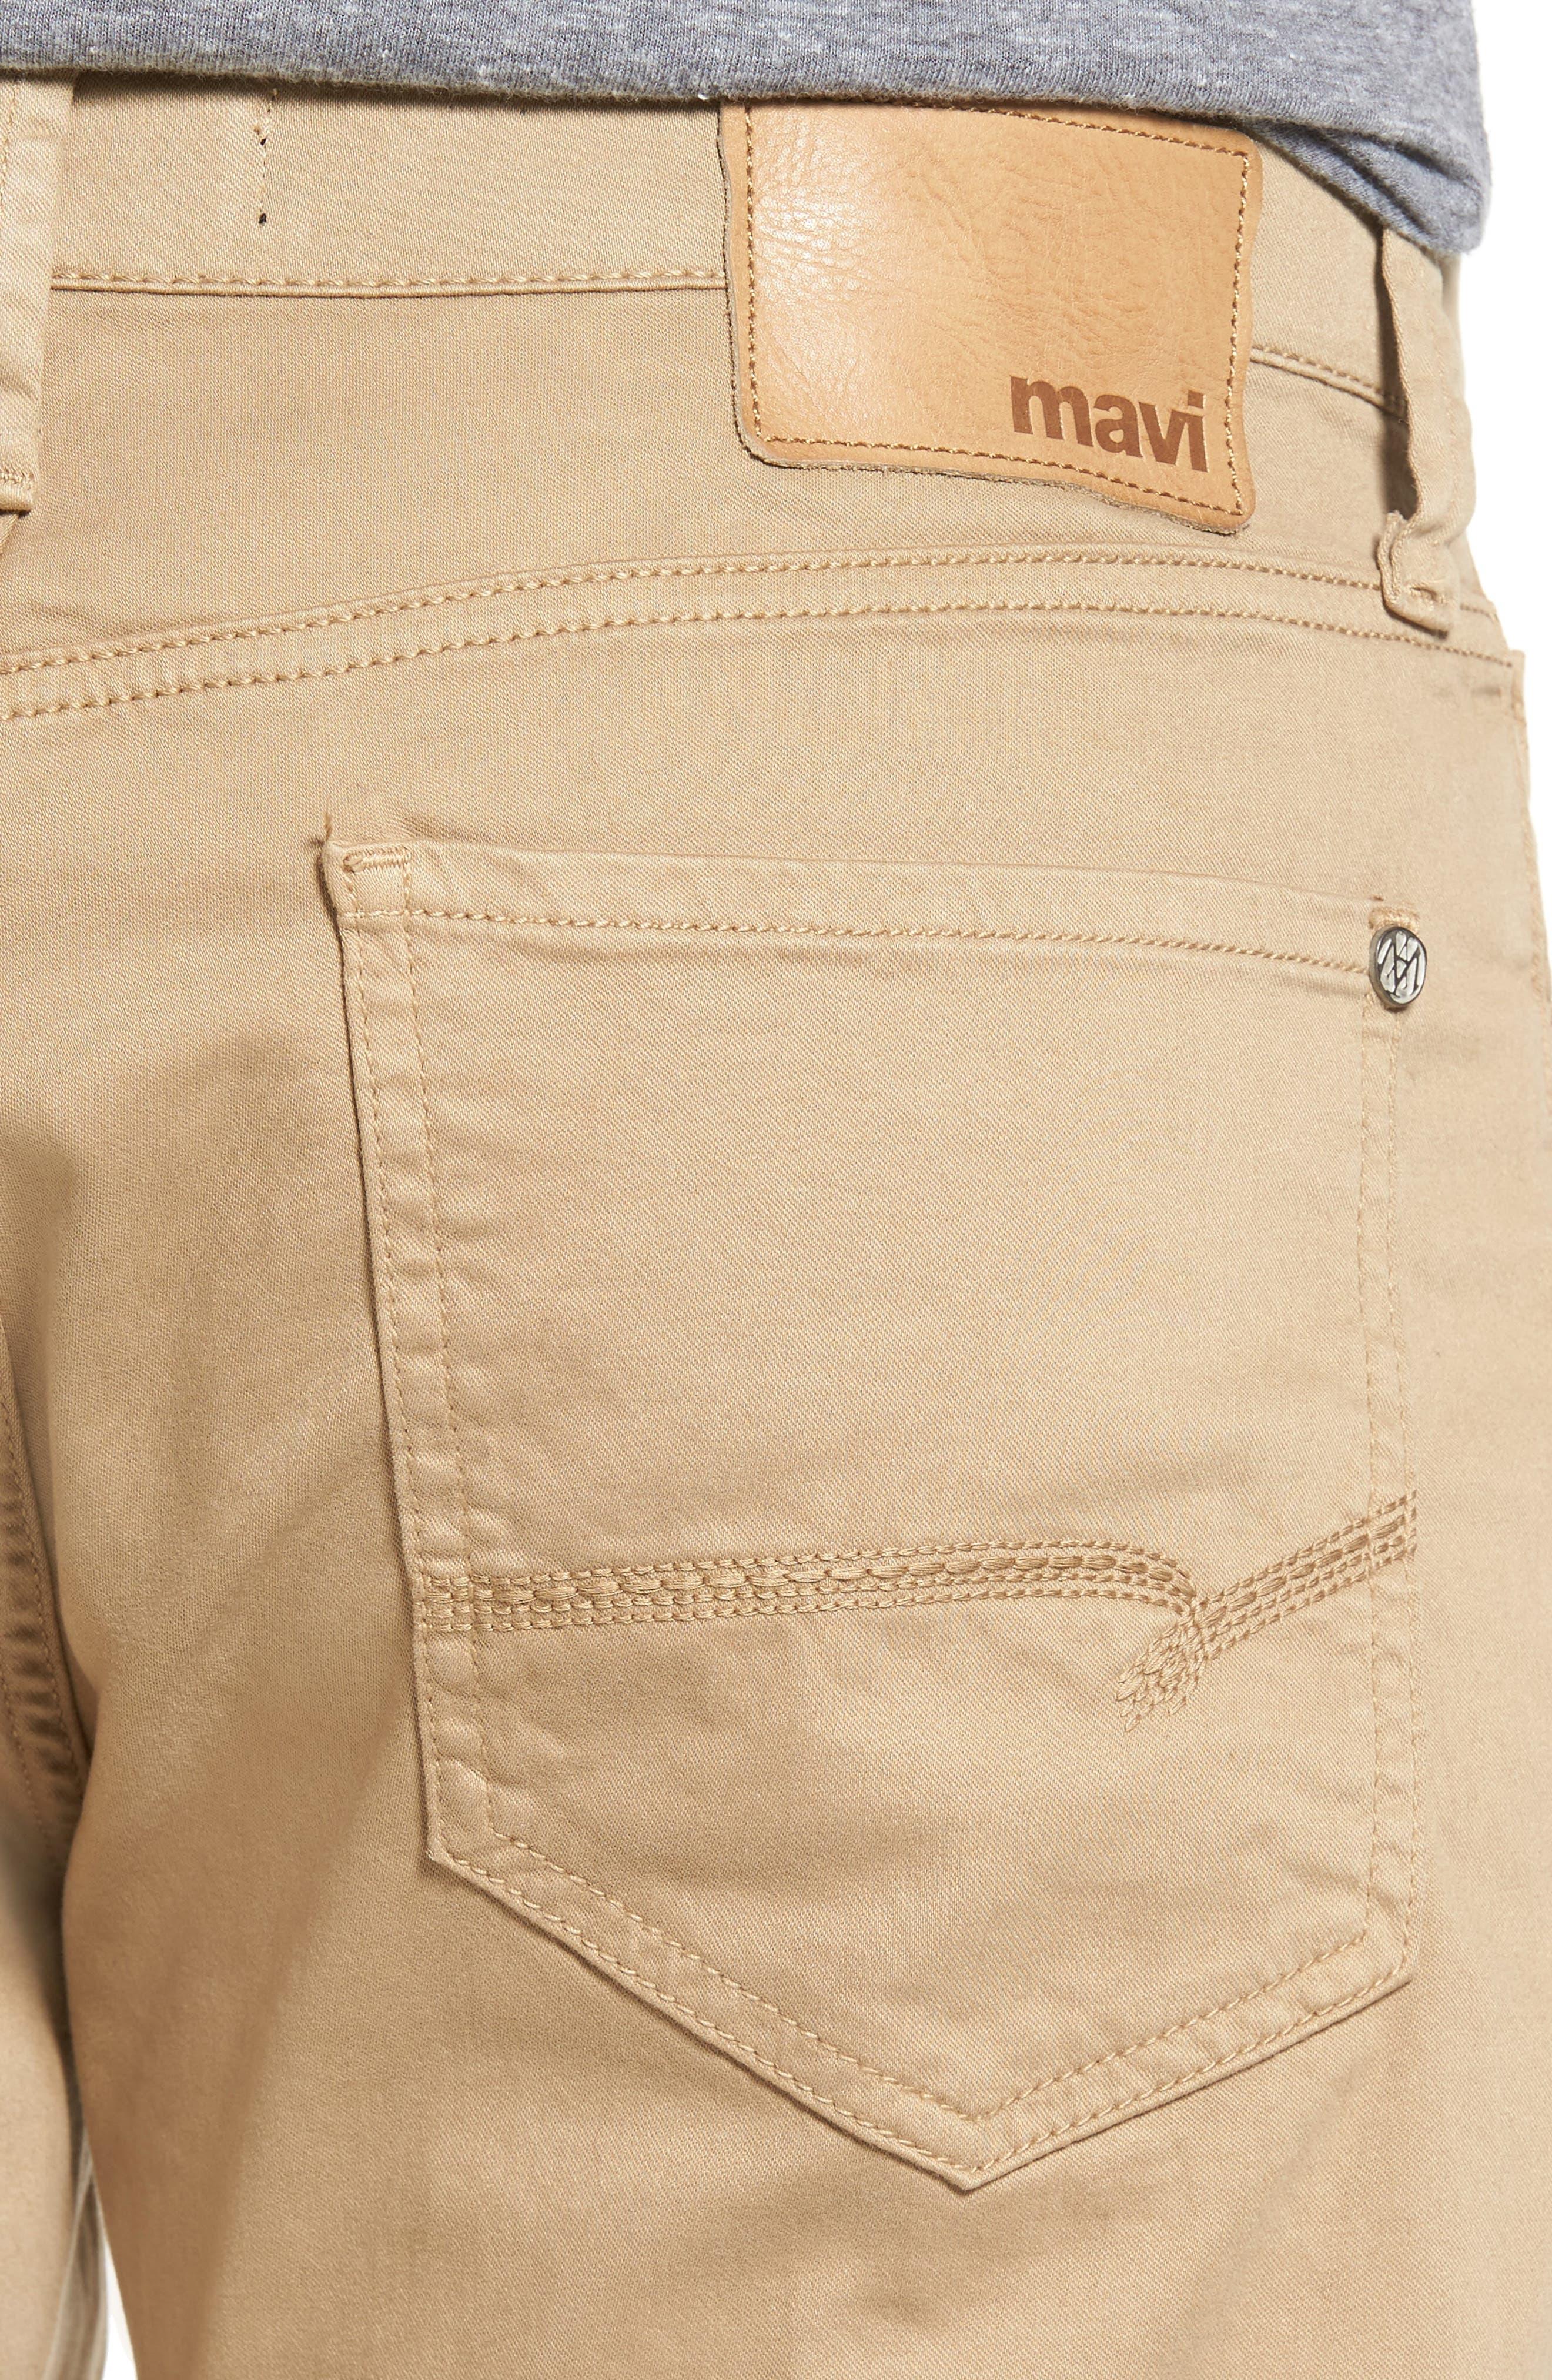 Matt Relaxed Fit Jeans,                             Alternate thumbnail 4, color,                             British Khaki Twill